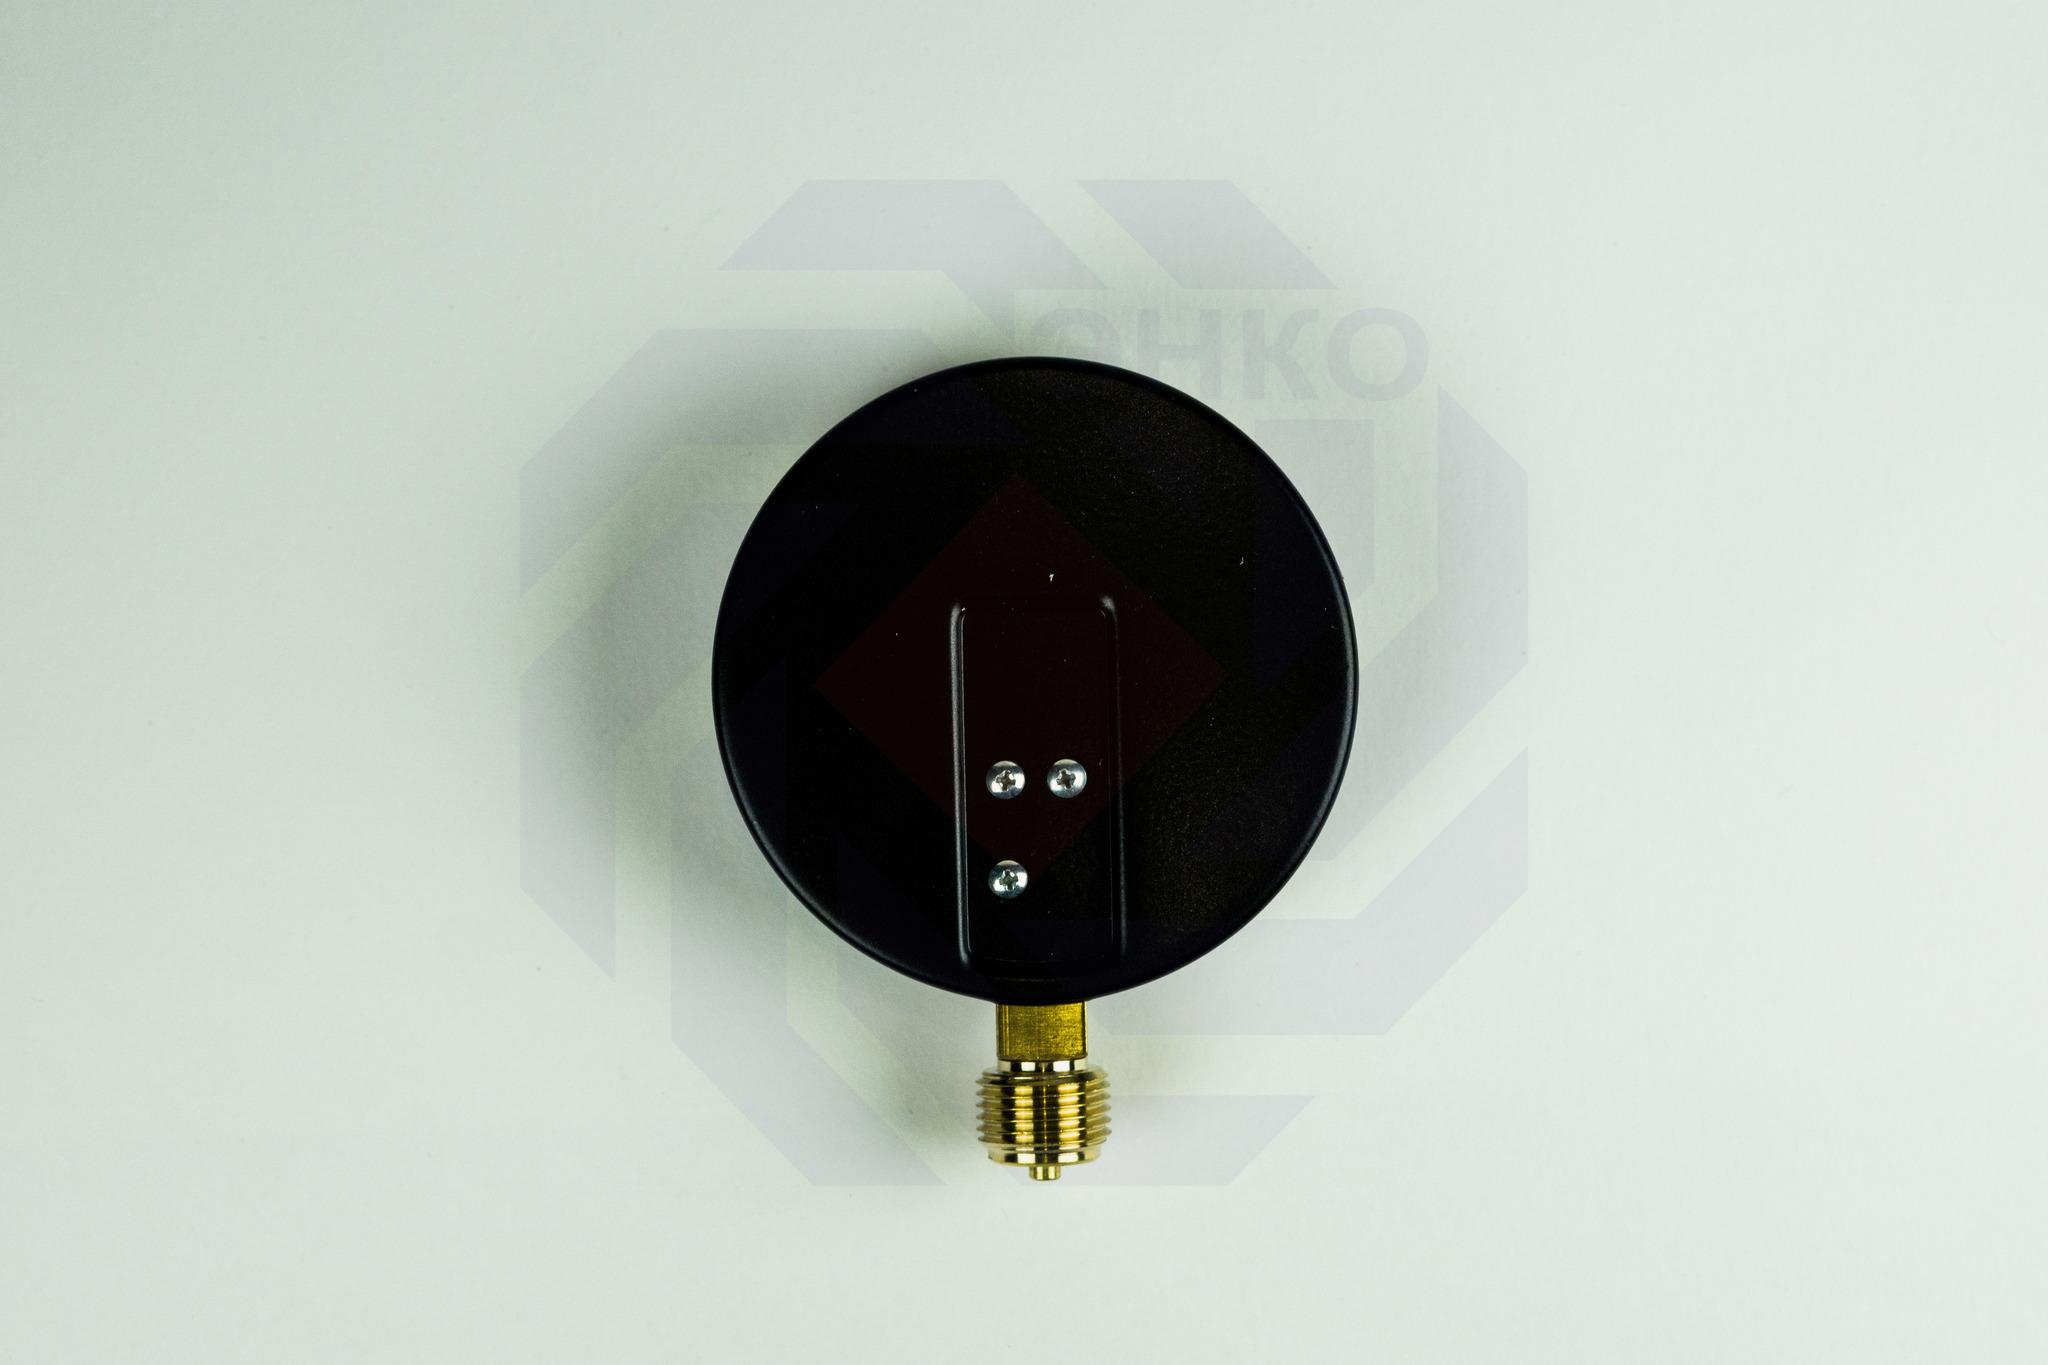 Манометр радиальный WATTS MDR 100/10 (F+R250) 0-10 бар 100 мм ½